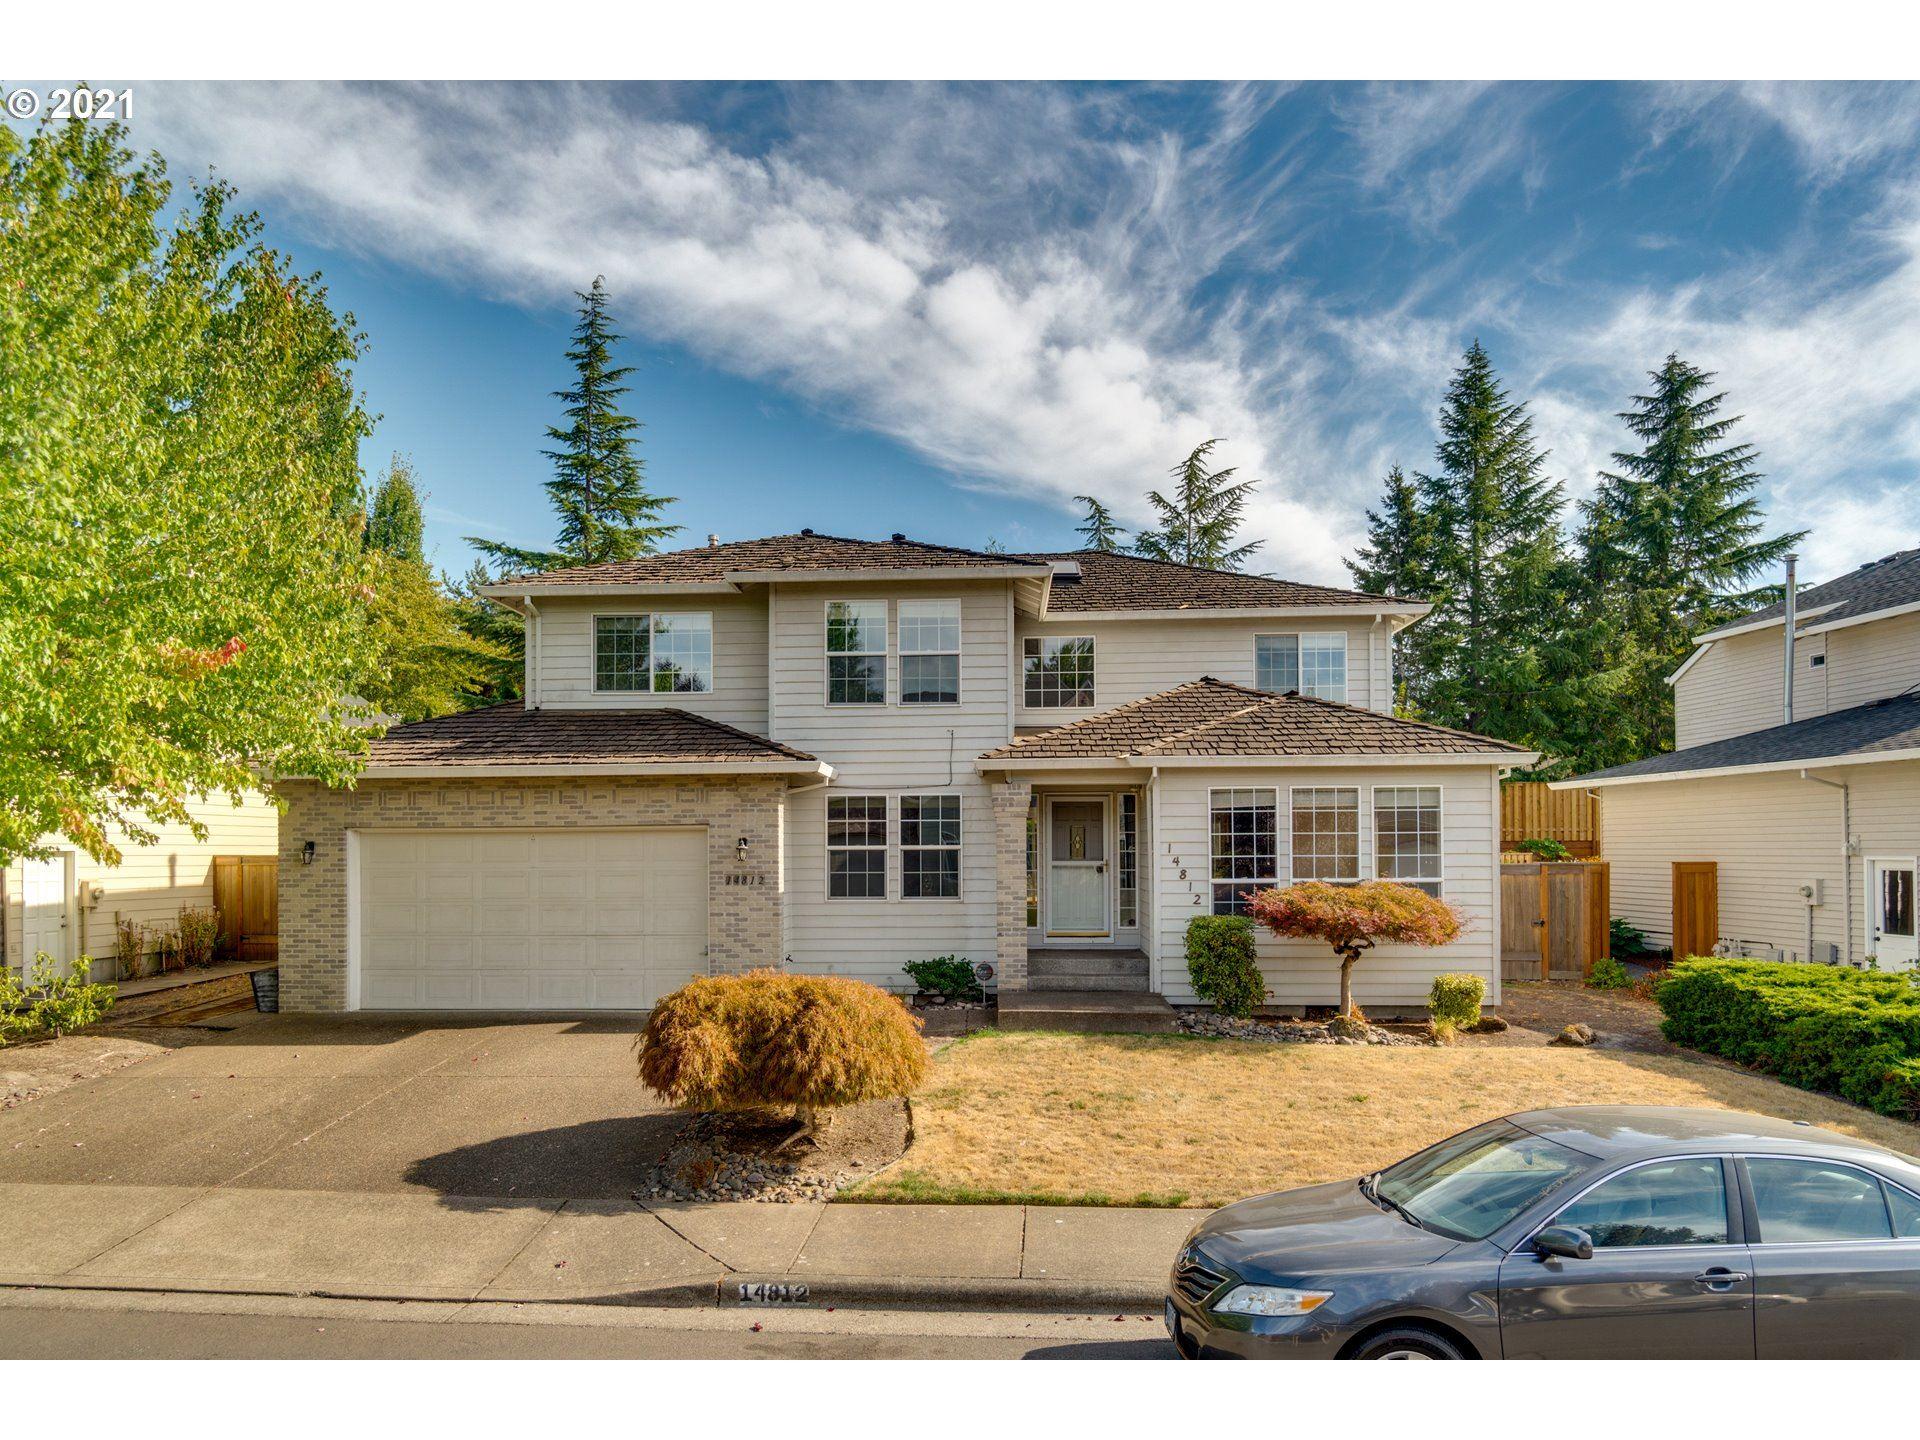 14812 NW APPLEGATE LN, Portland, OR 97229 - MLS#: 21366510